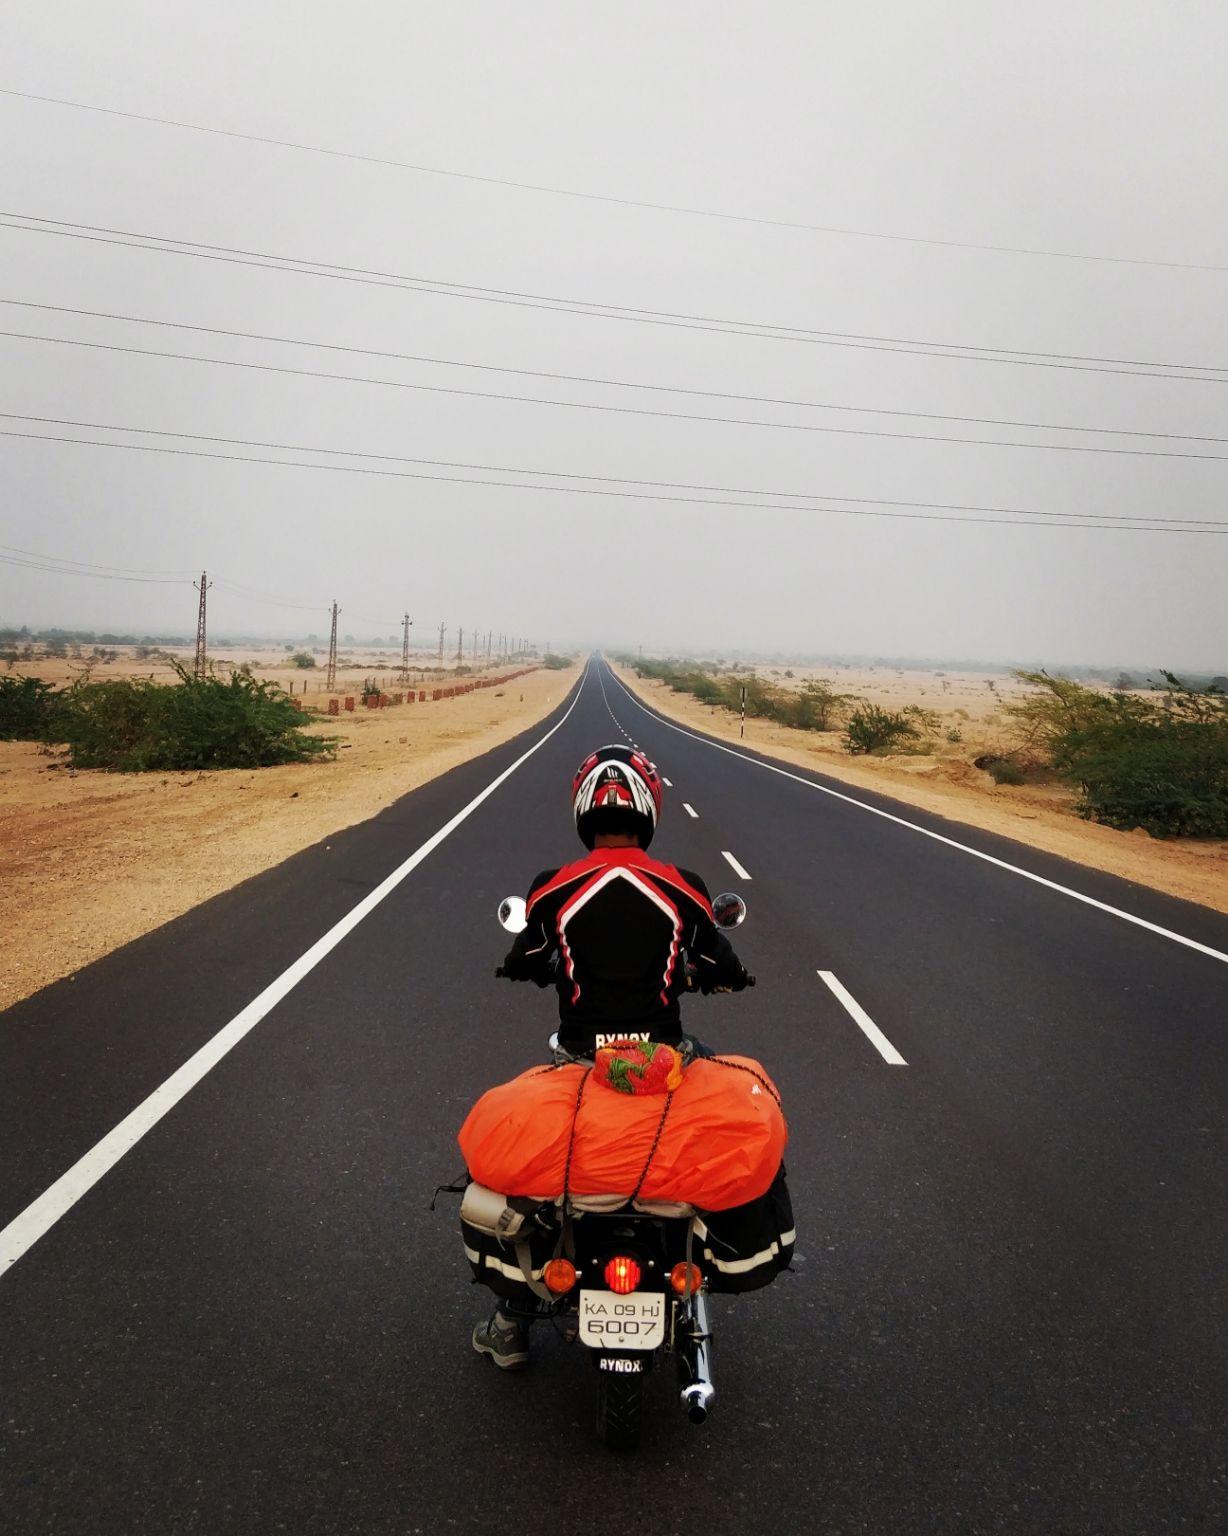 Photo of Rajasthan By Savin Gurkar